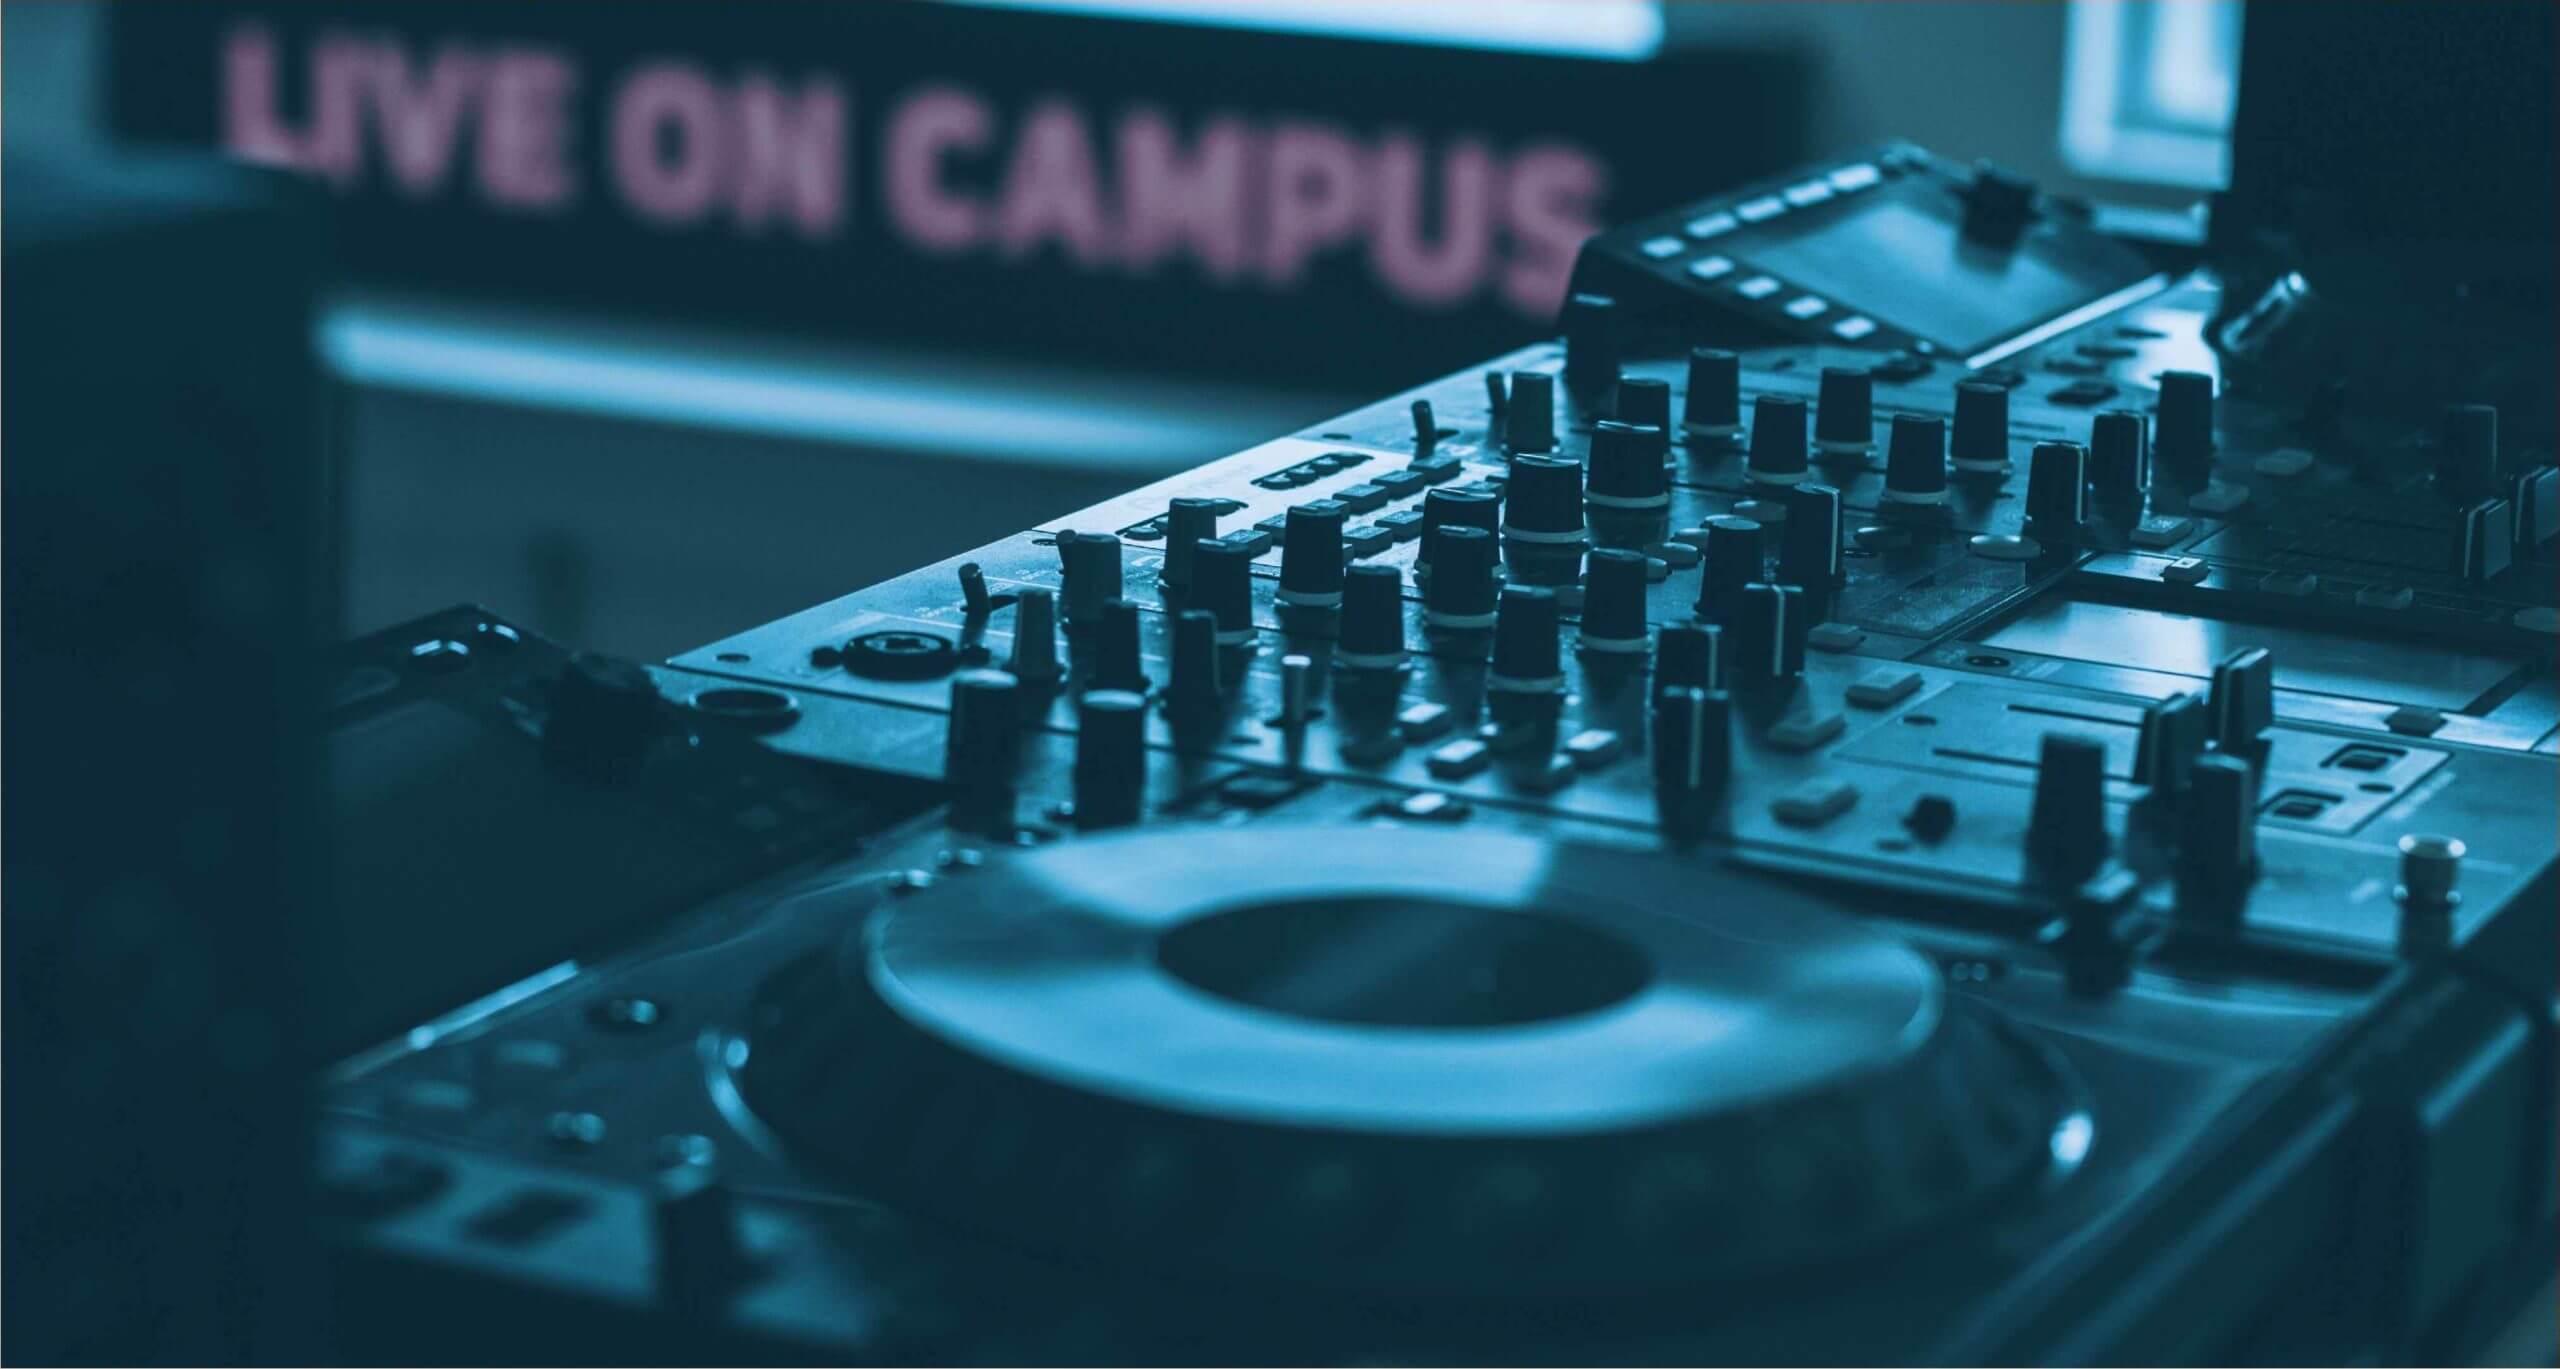 Arts, Audio/Video Technology & Communications Careers